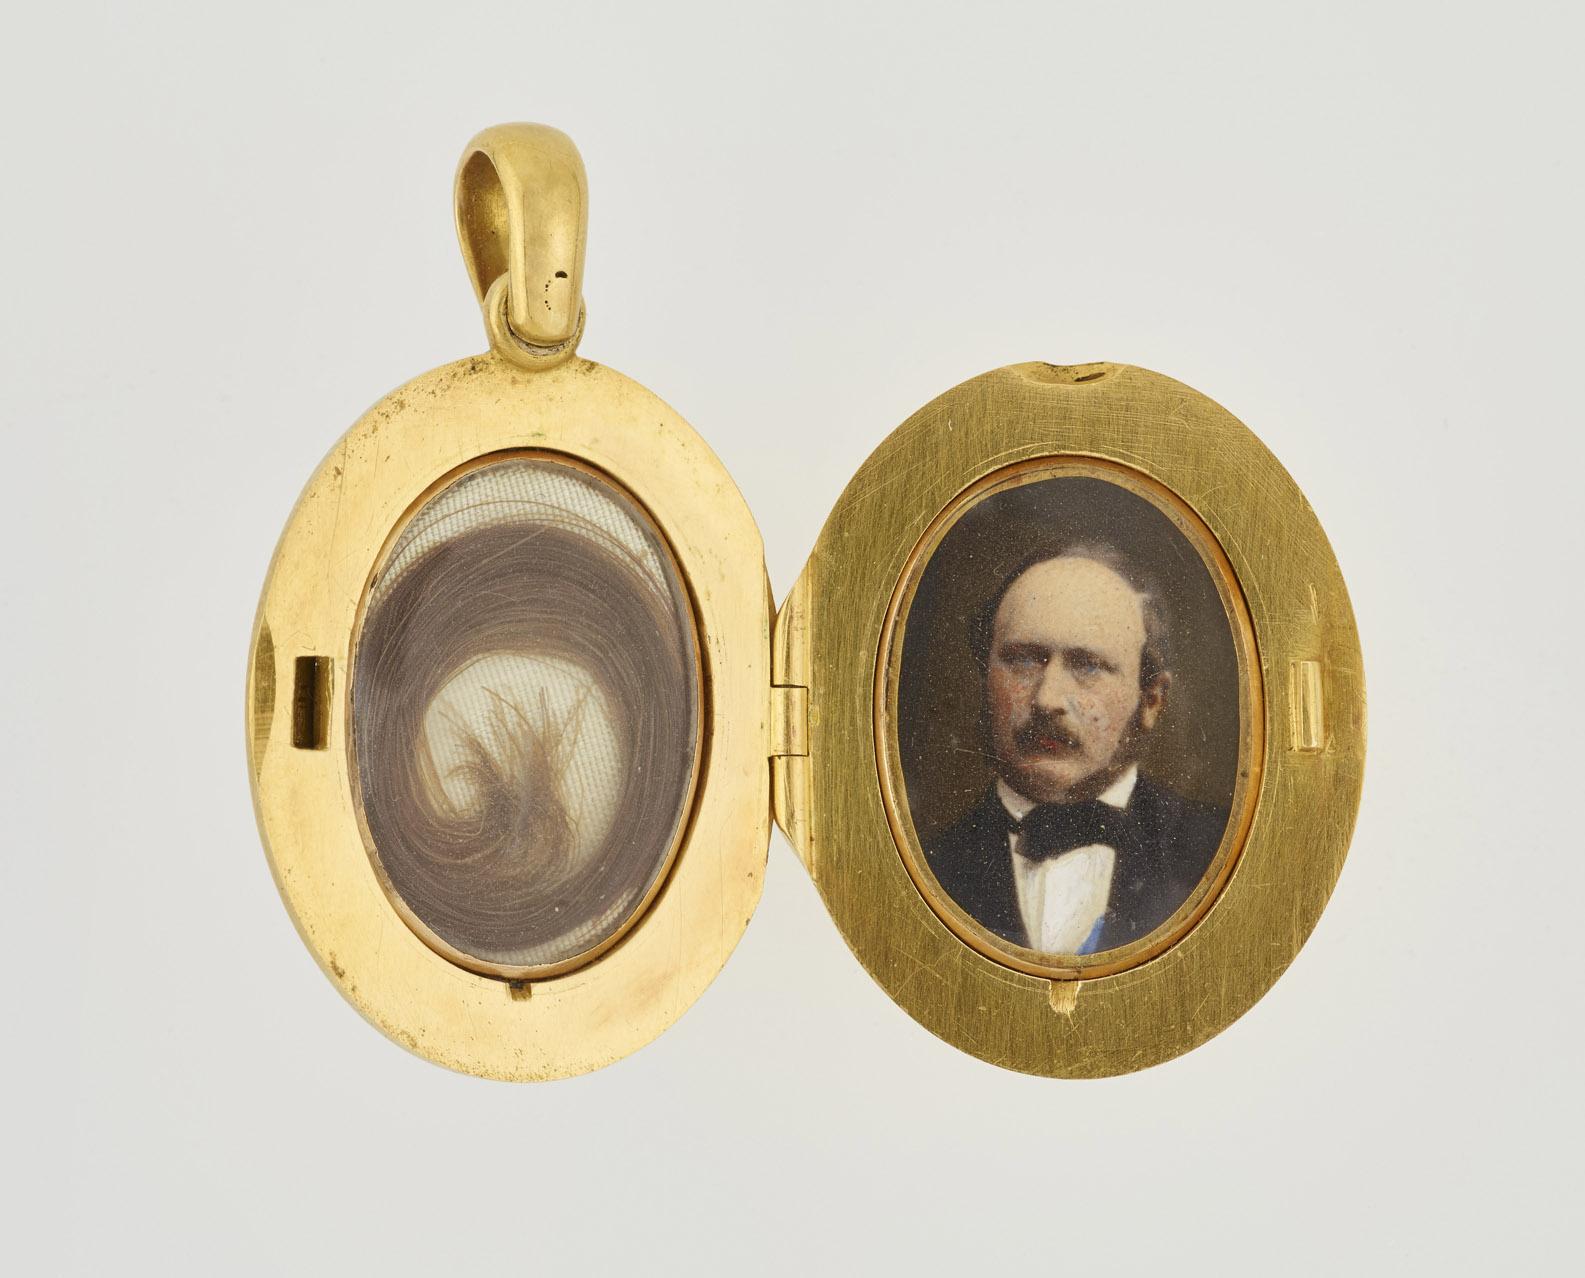 Interior view of Queen Victoria's locket (via Royal Collection)